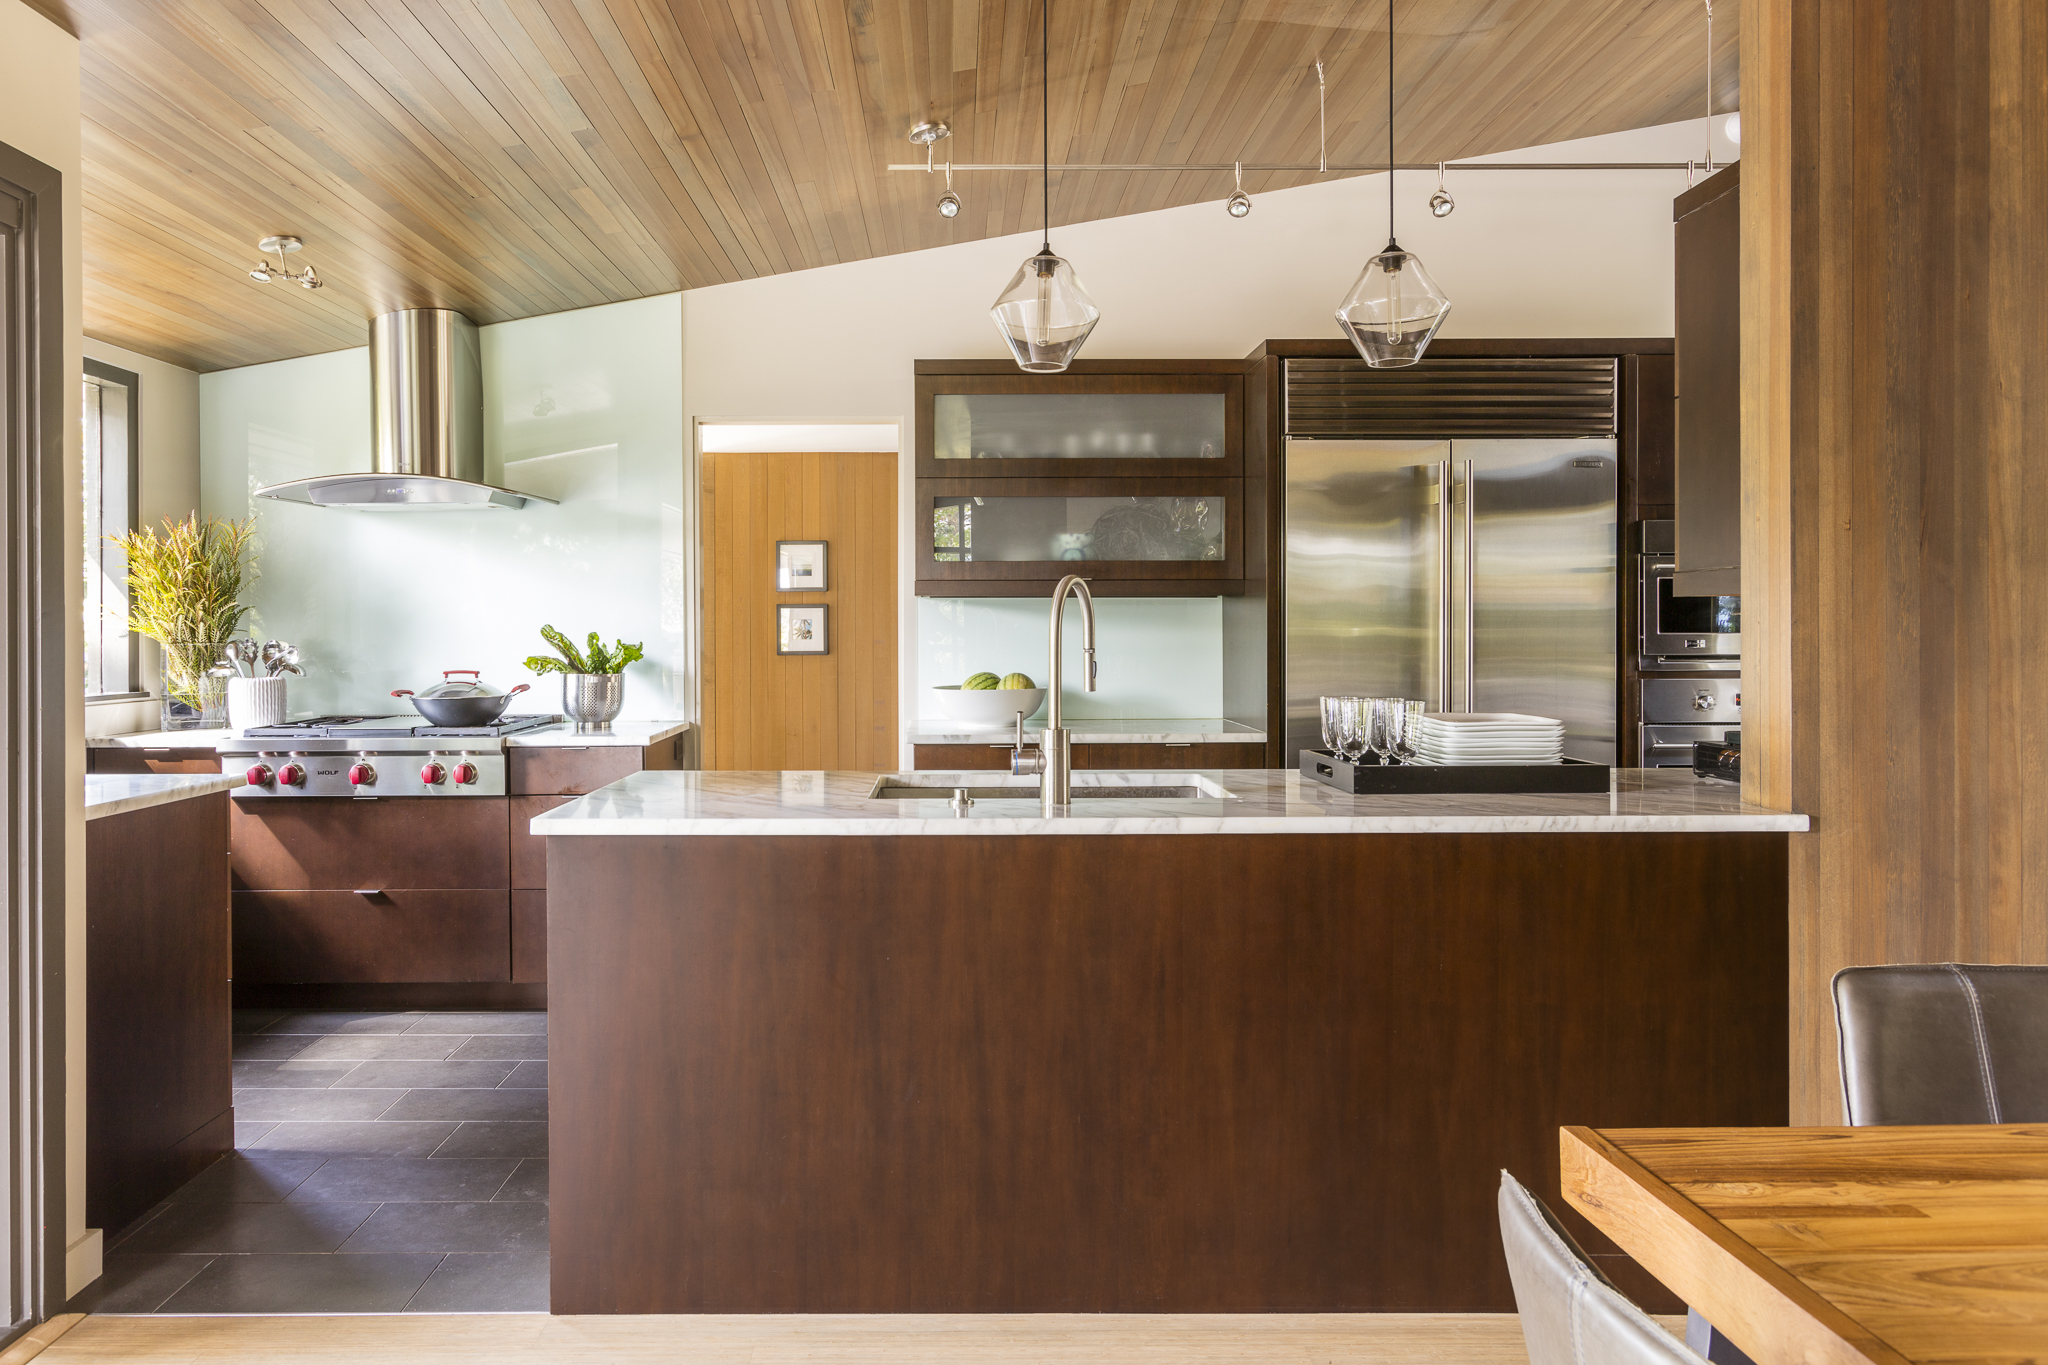 paul-moon-design-windermere-contemporary-kitchen.jpg